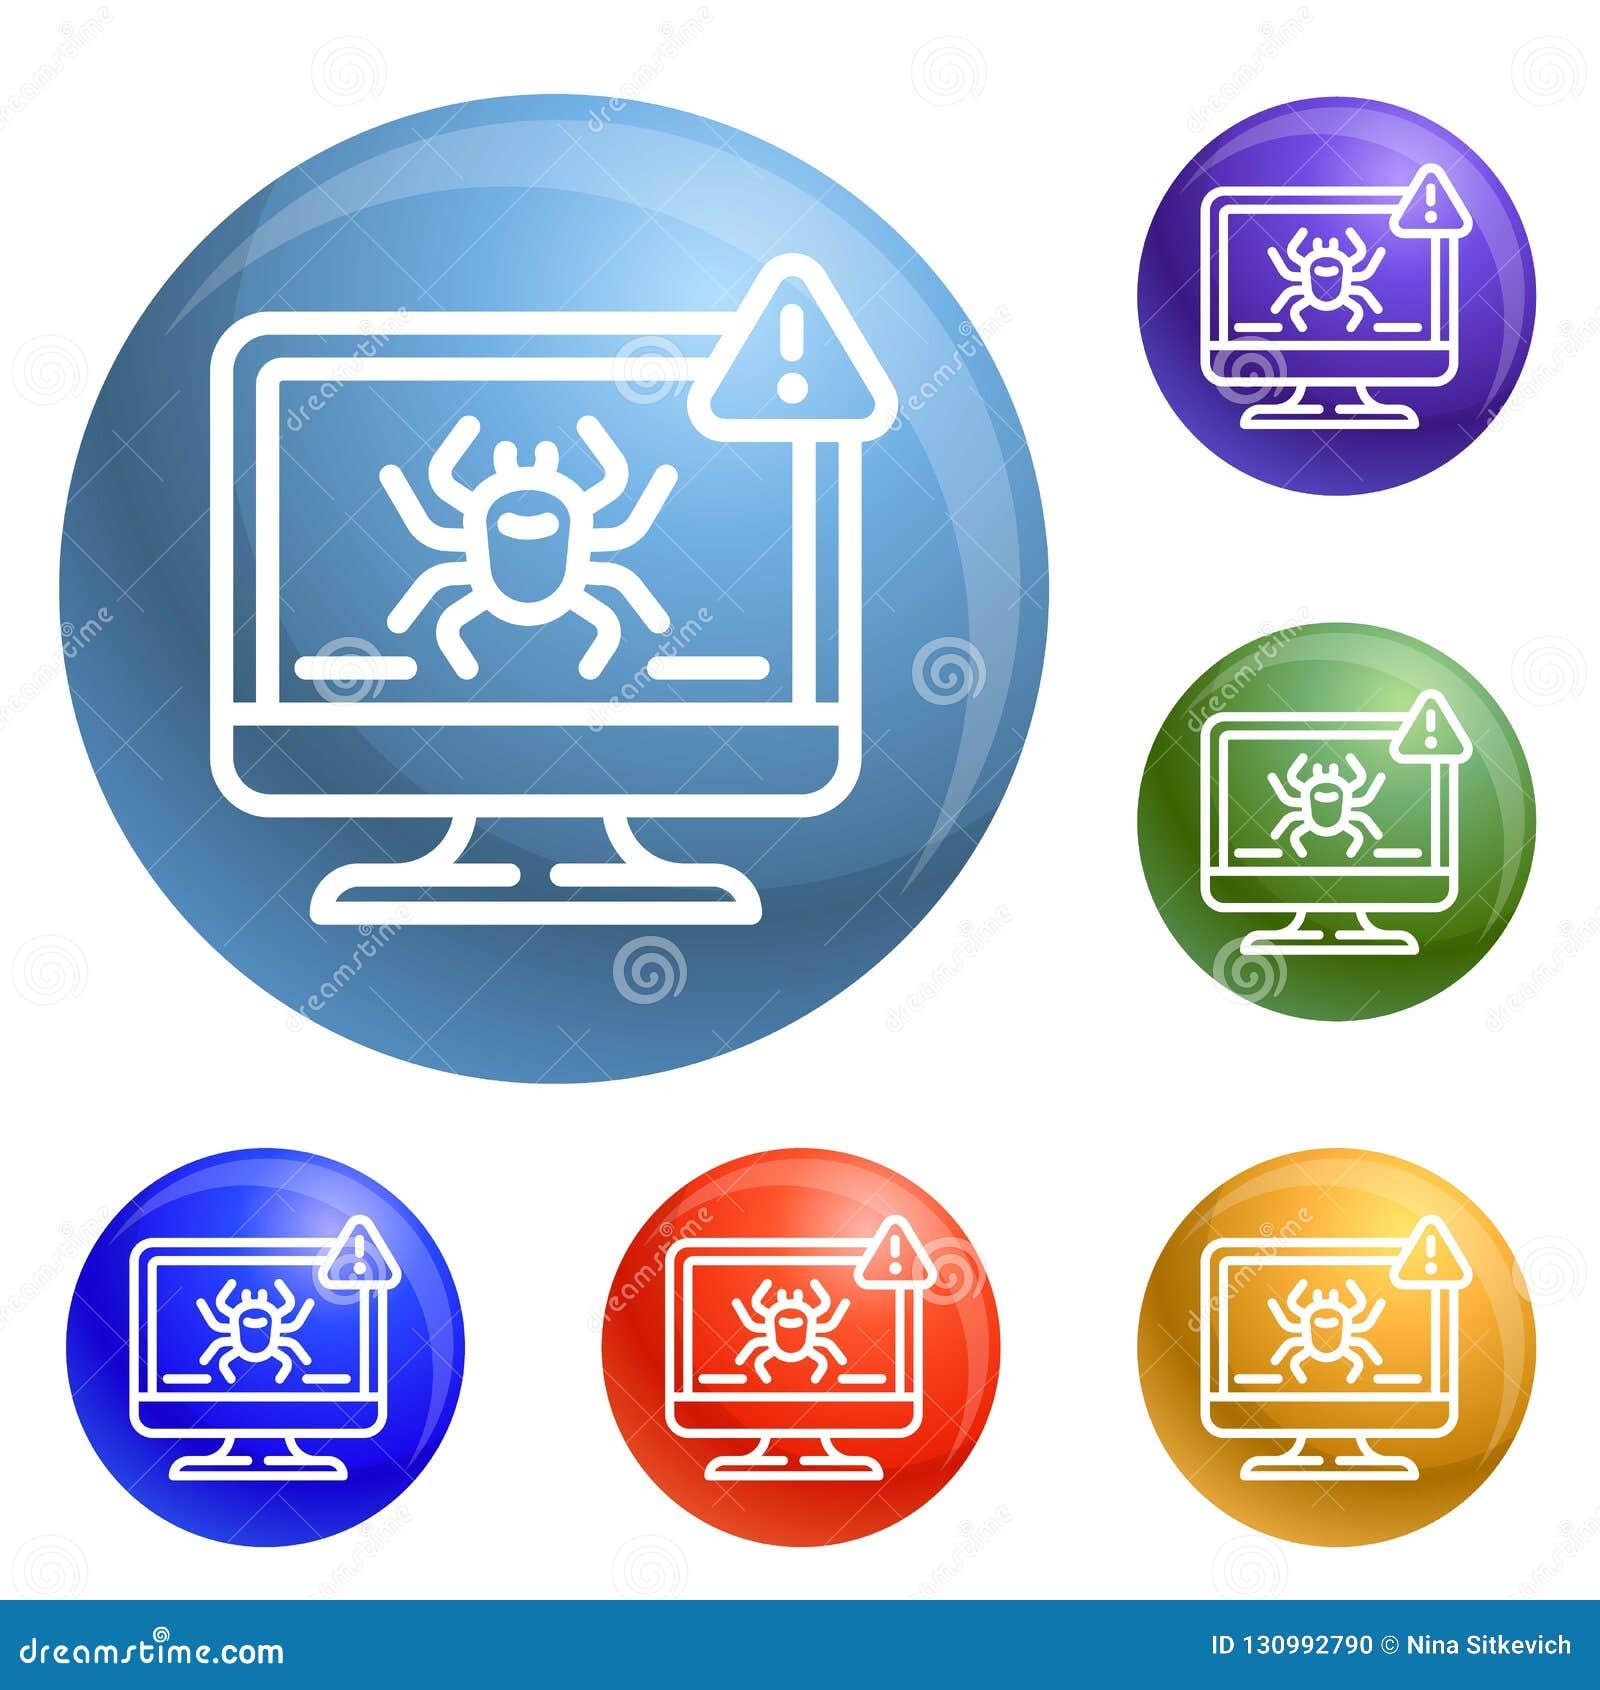 Computer Virus Detection Icons Set Vector Stock Vector